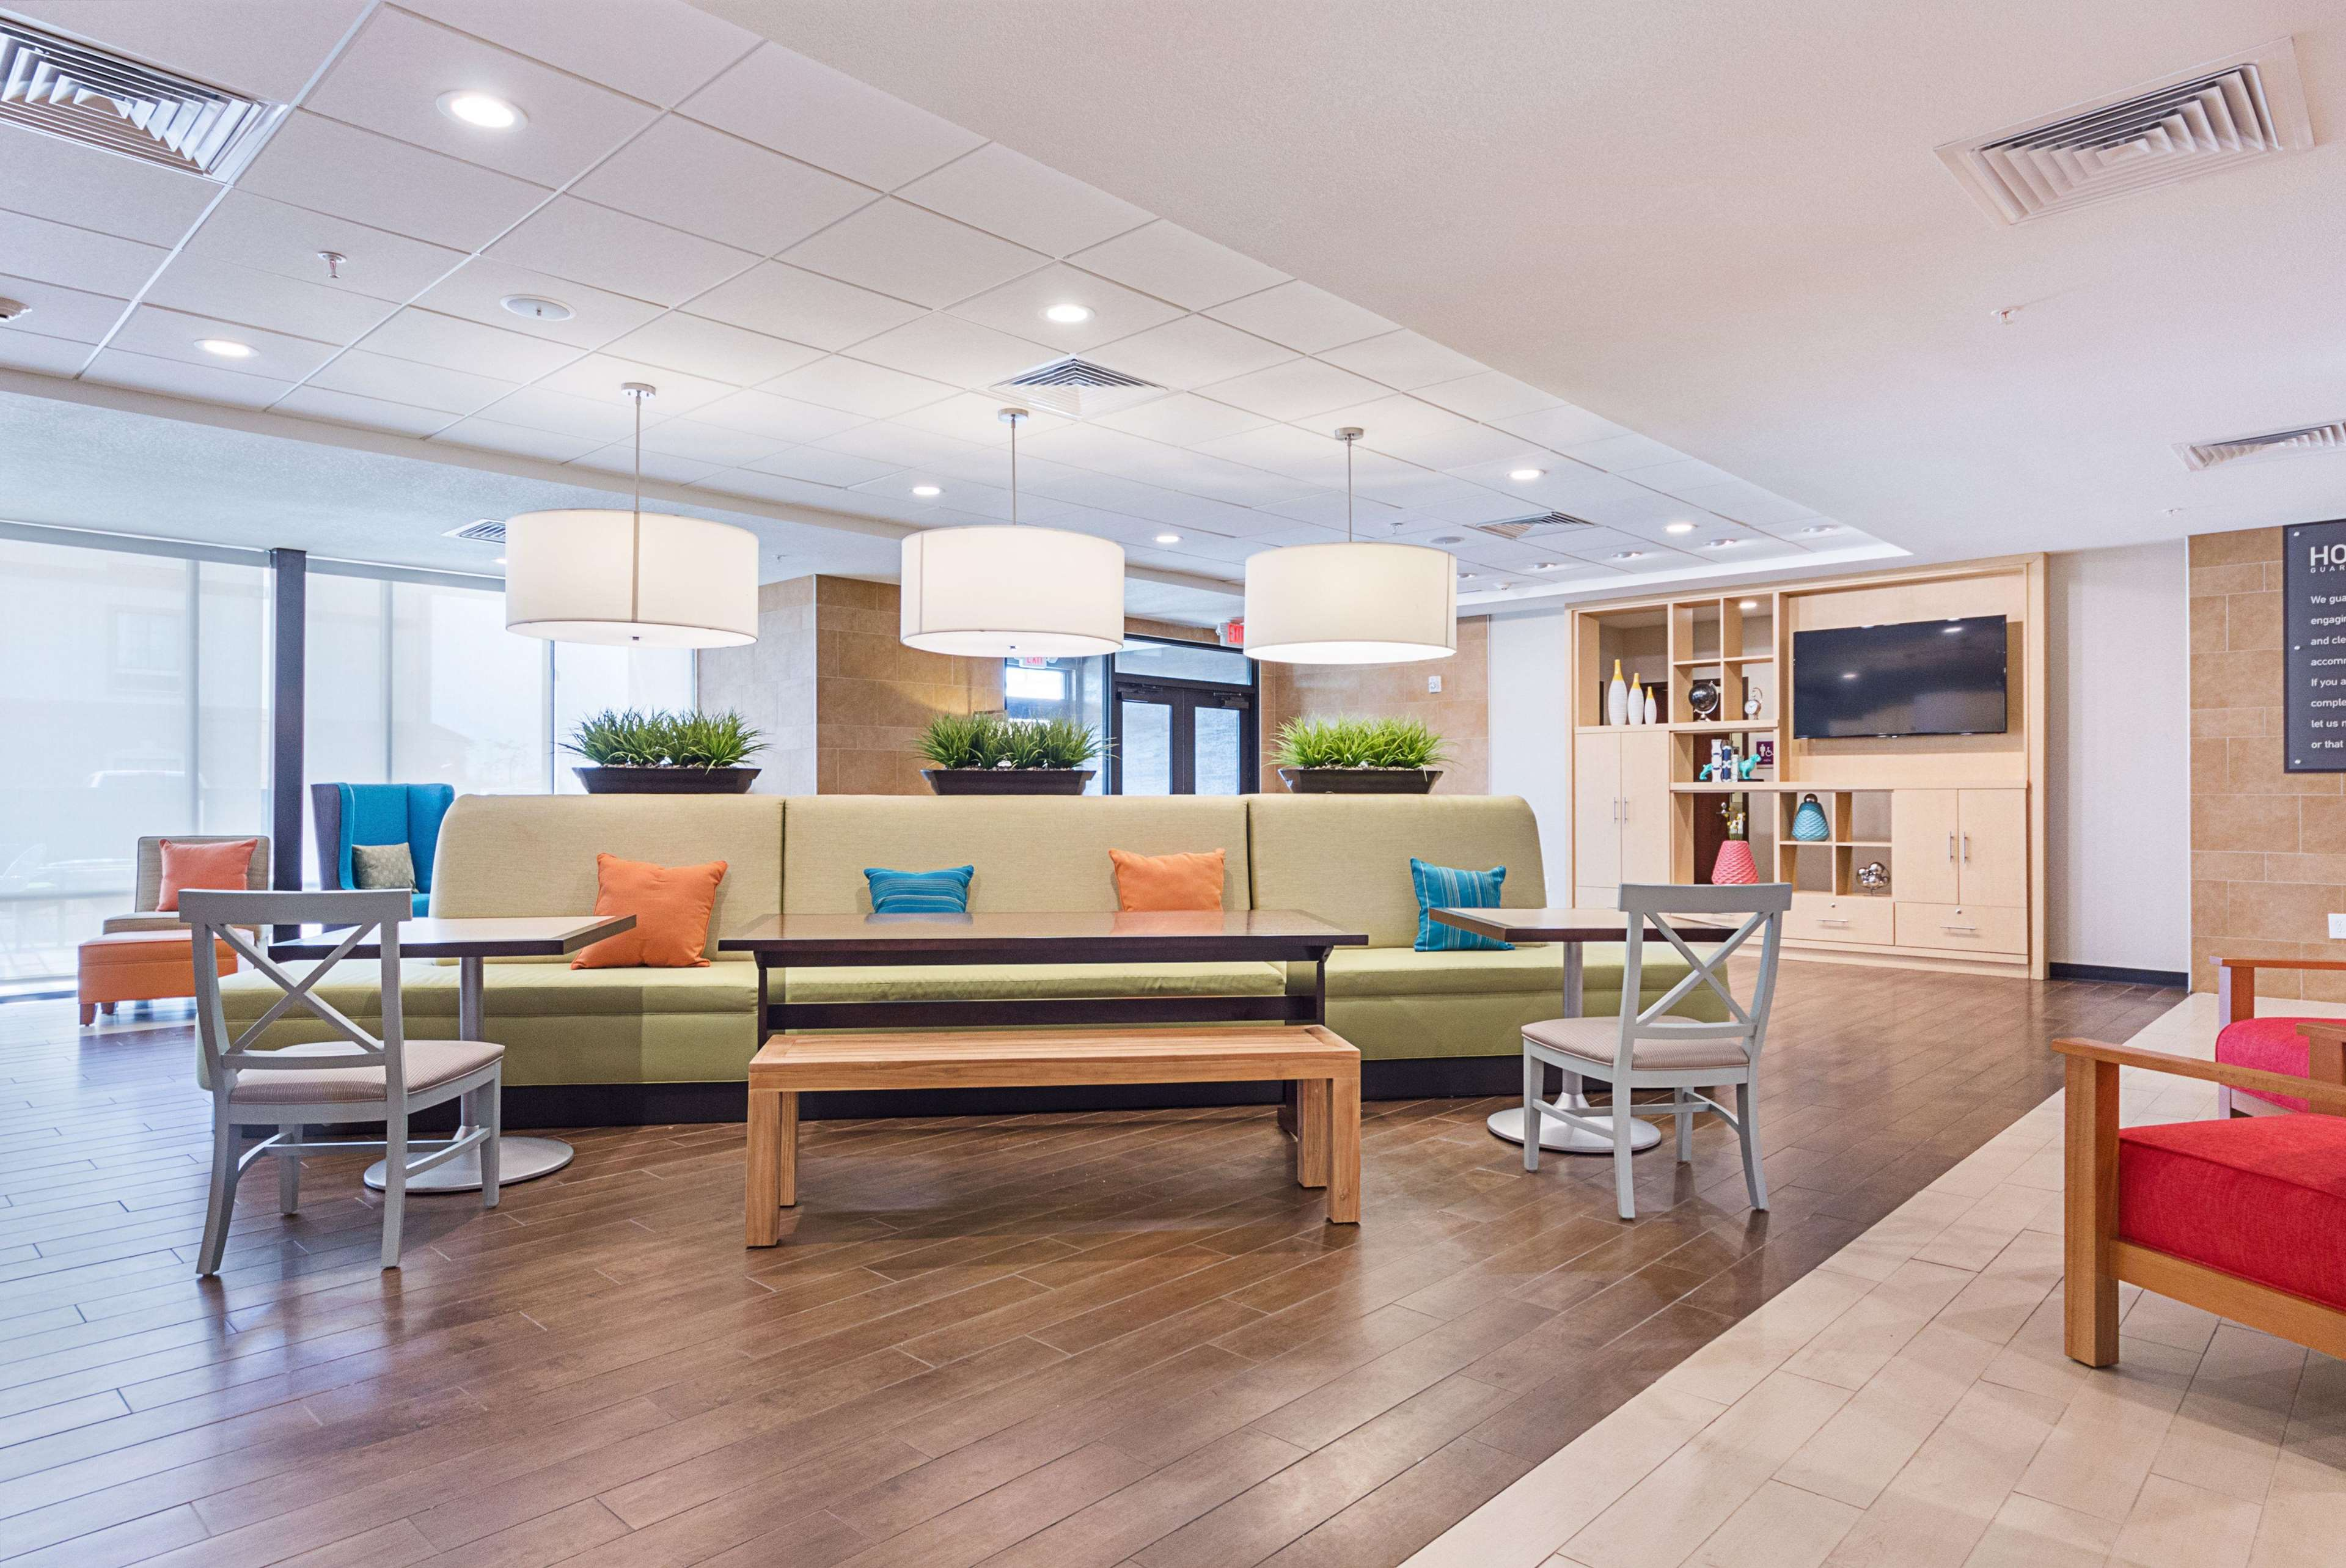 Home 2 Suites by Hilton - Yukon image 14